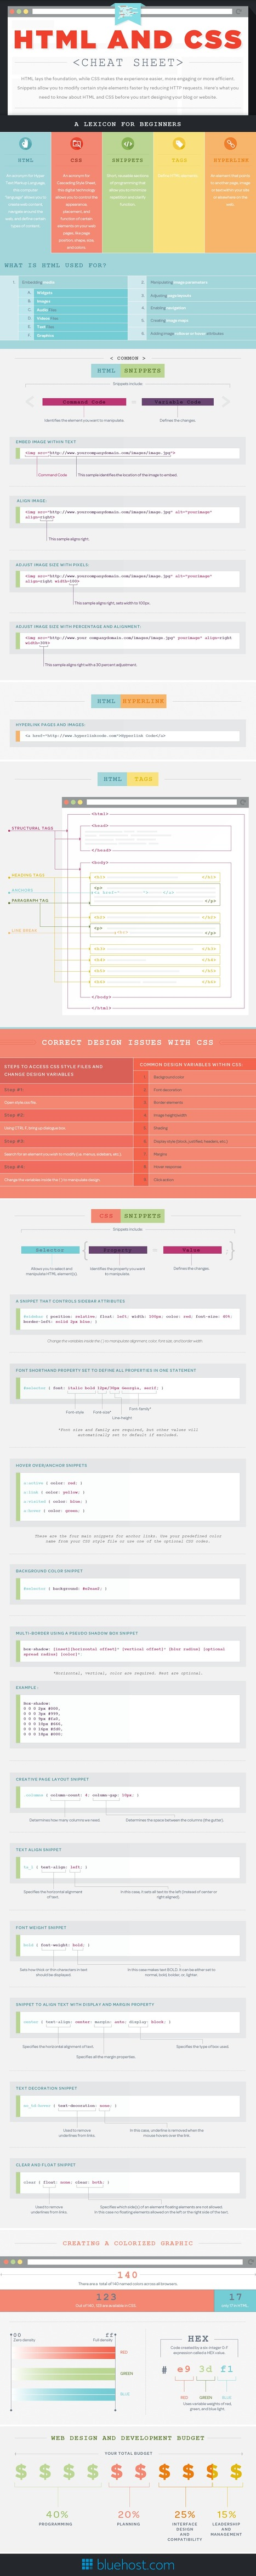 HTML & CSS Cheat Sheet | METROPOLIS STUFF | Scoop.it